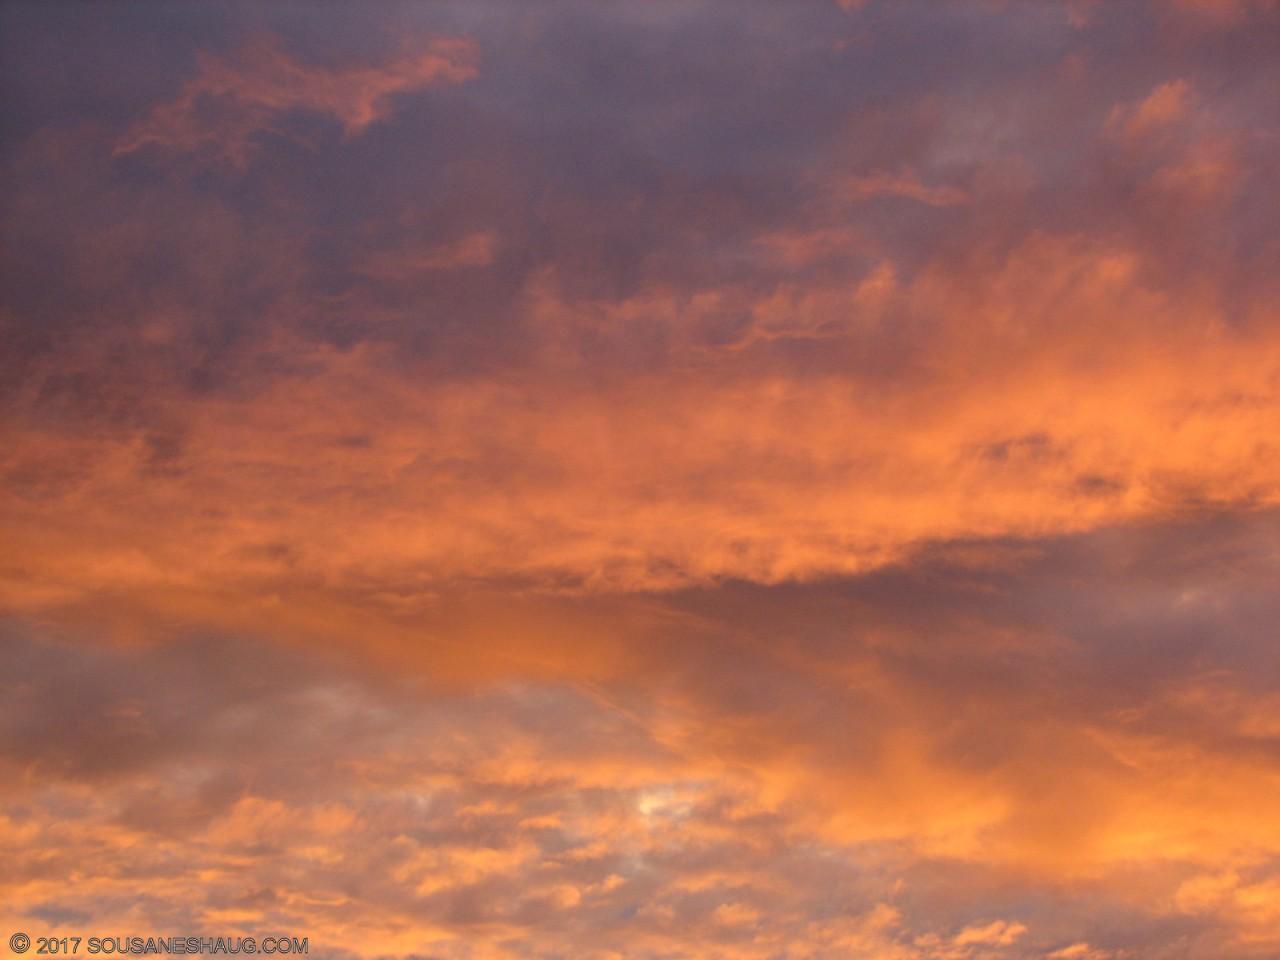 Sunset-sky-on-fire-1